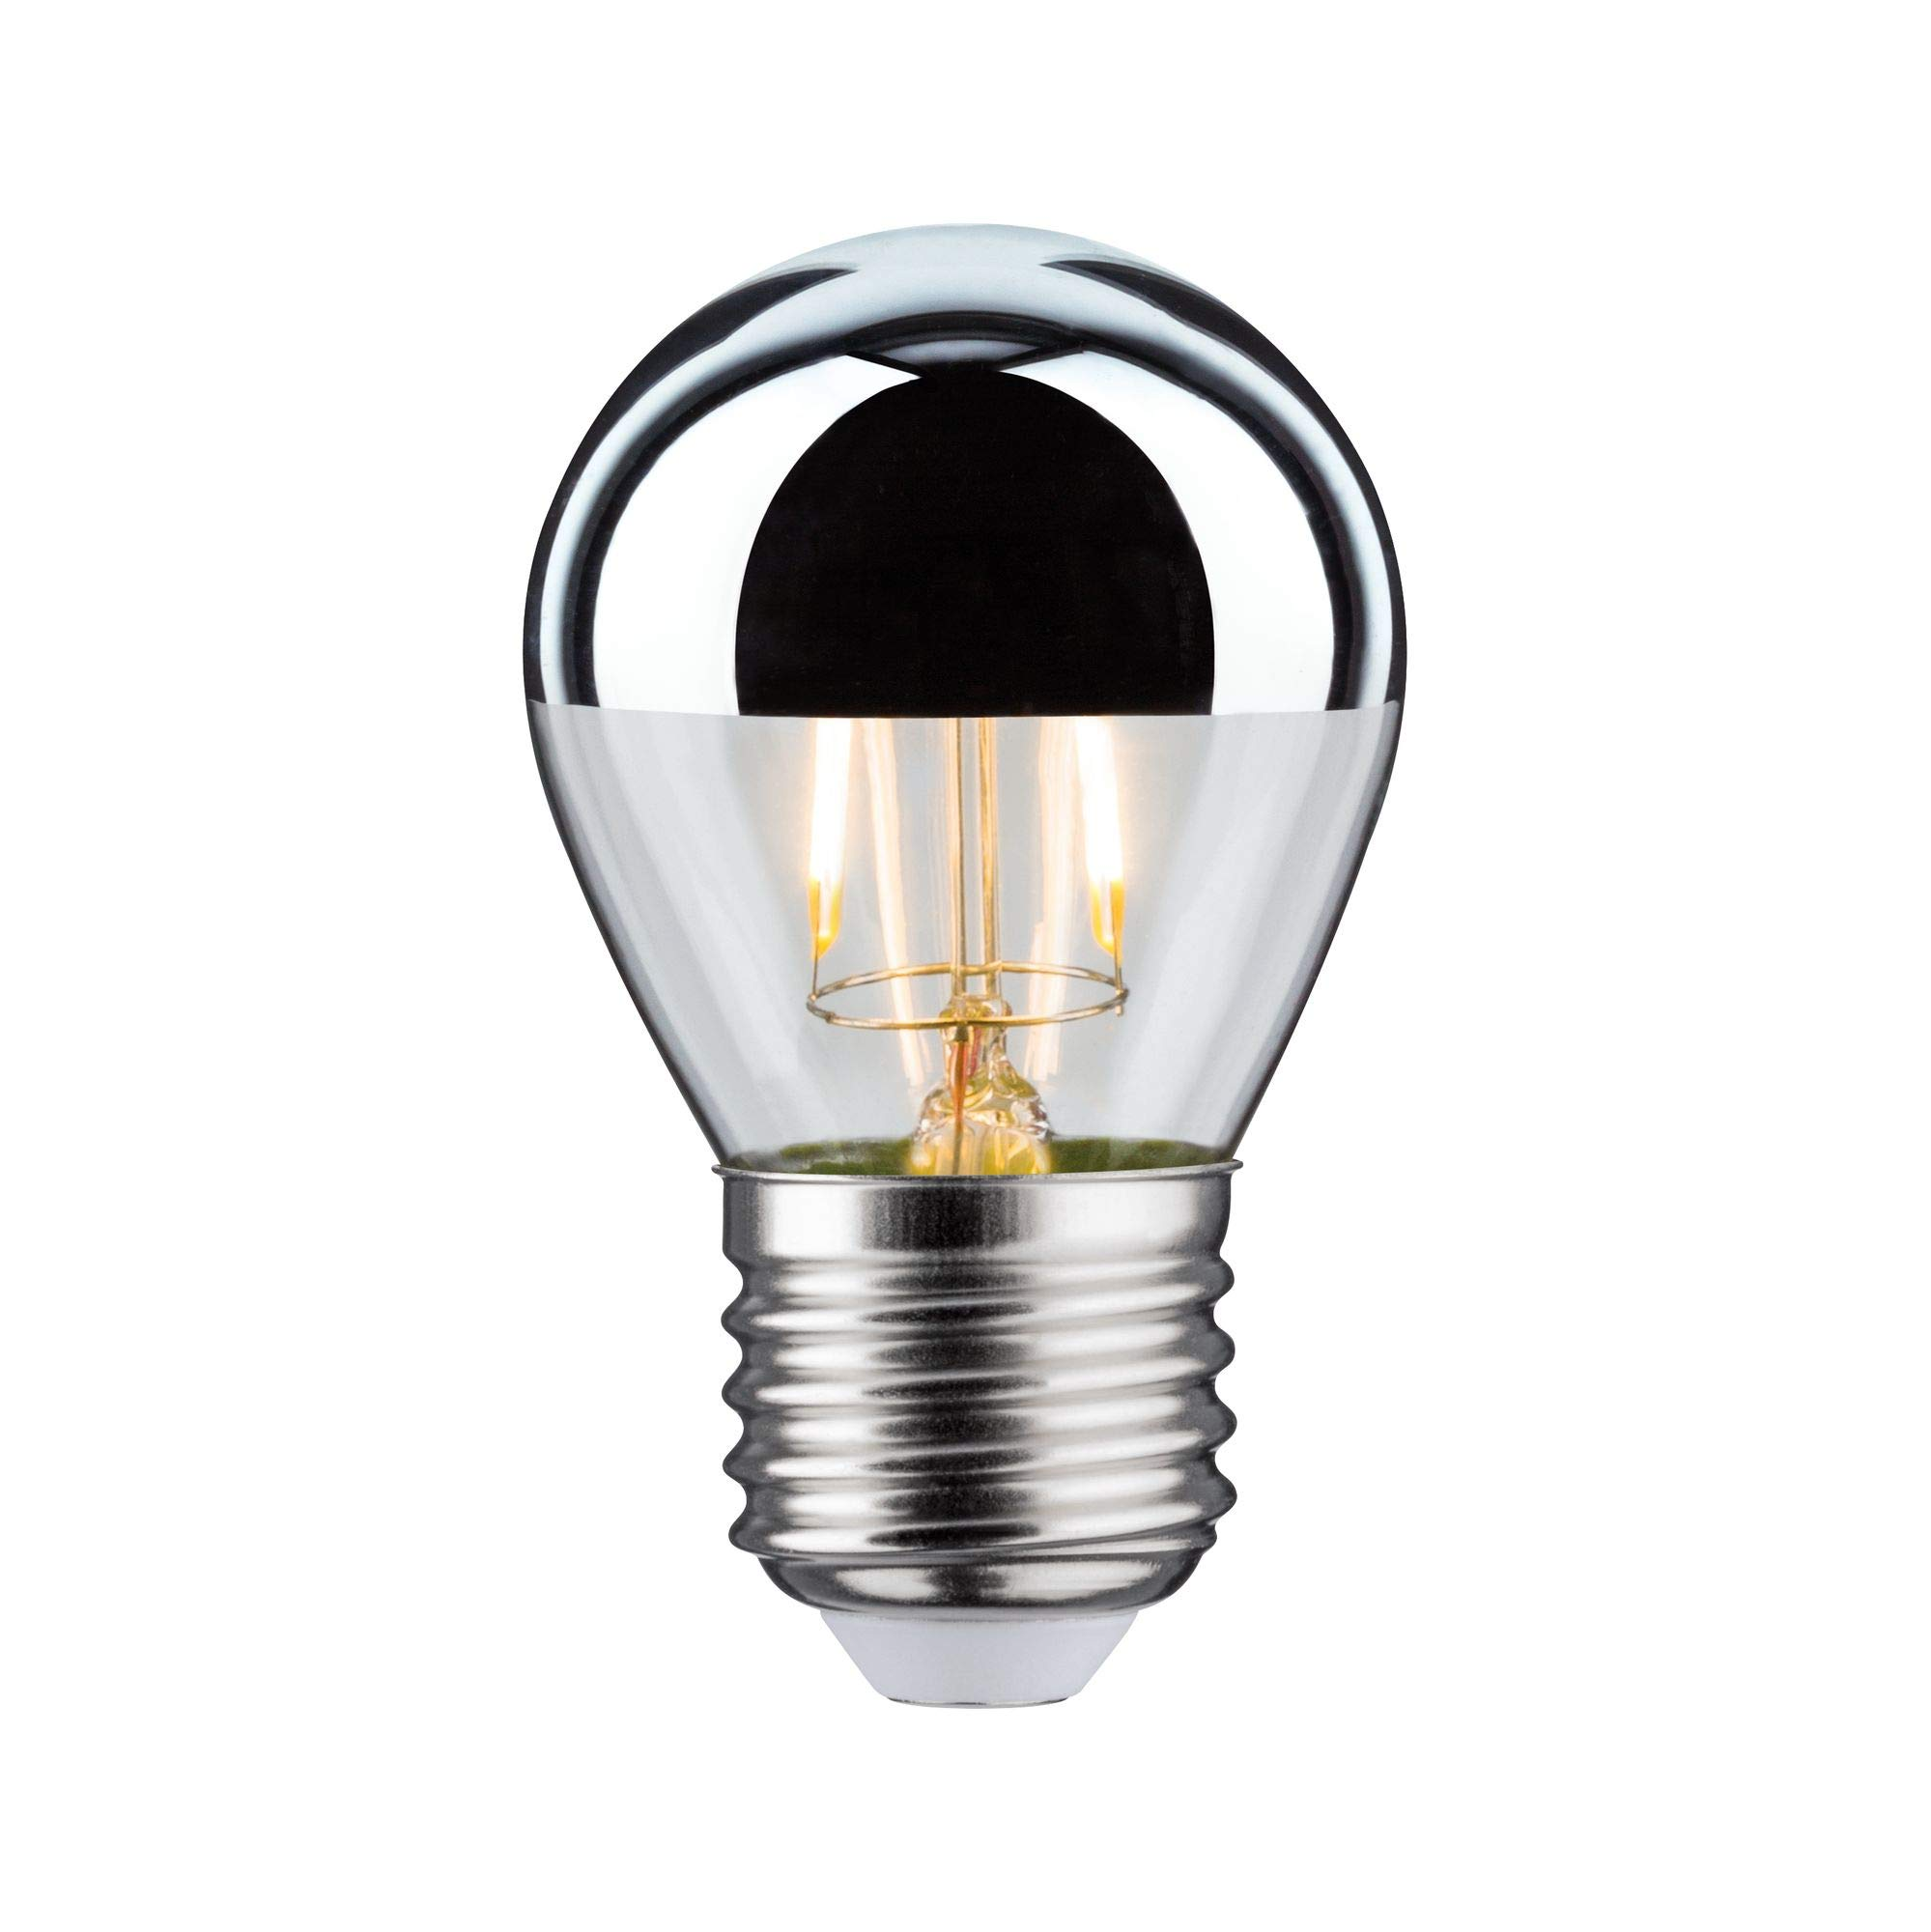 Paulmann LED Bulb, E27, 4.5 W, Crown